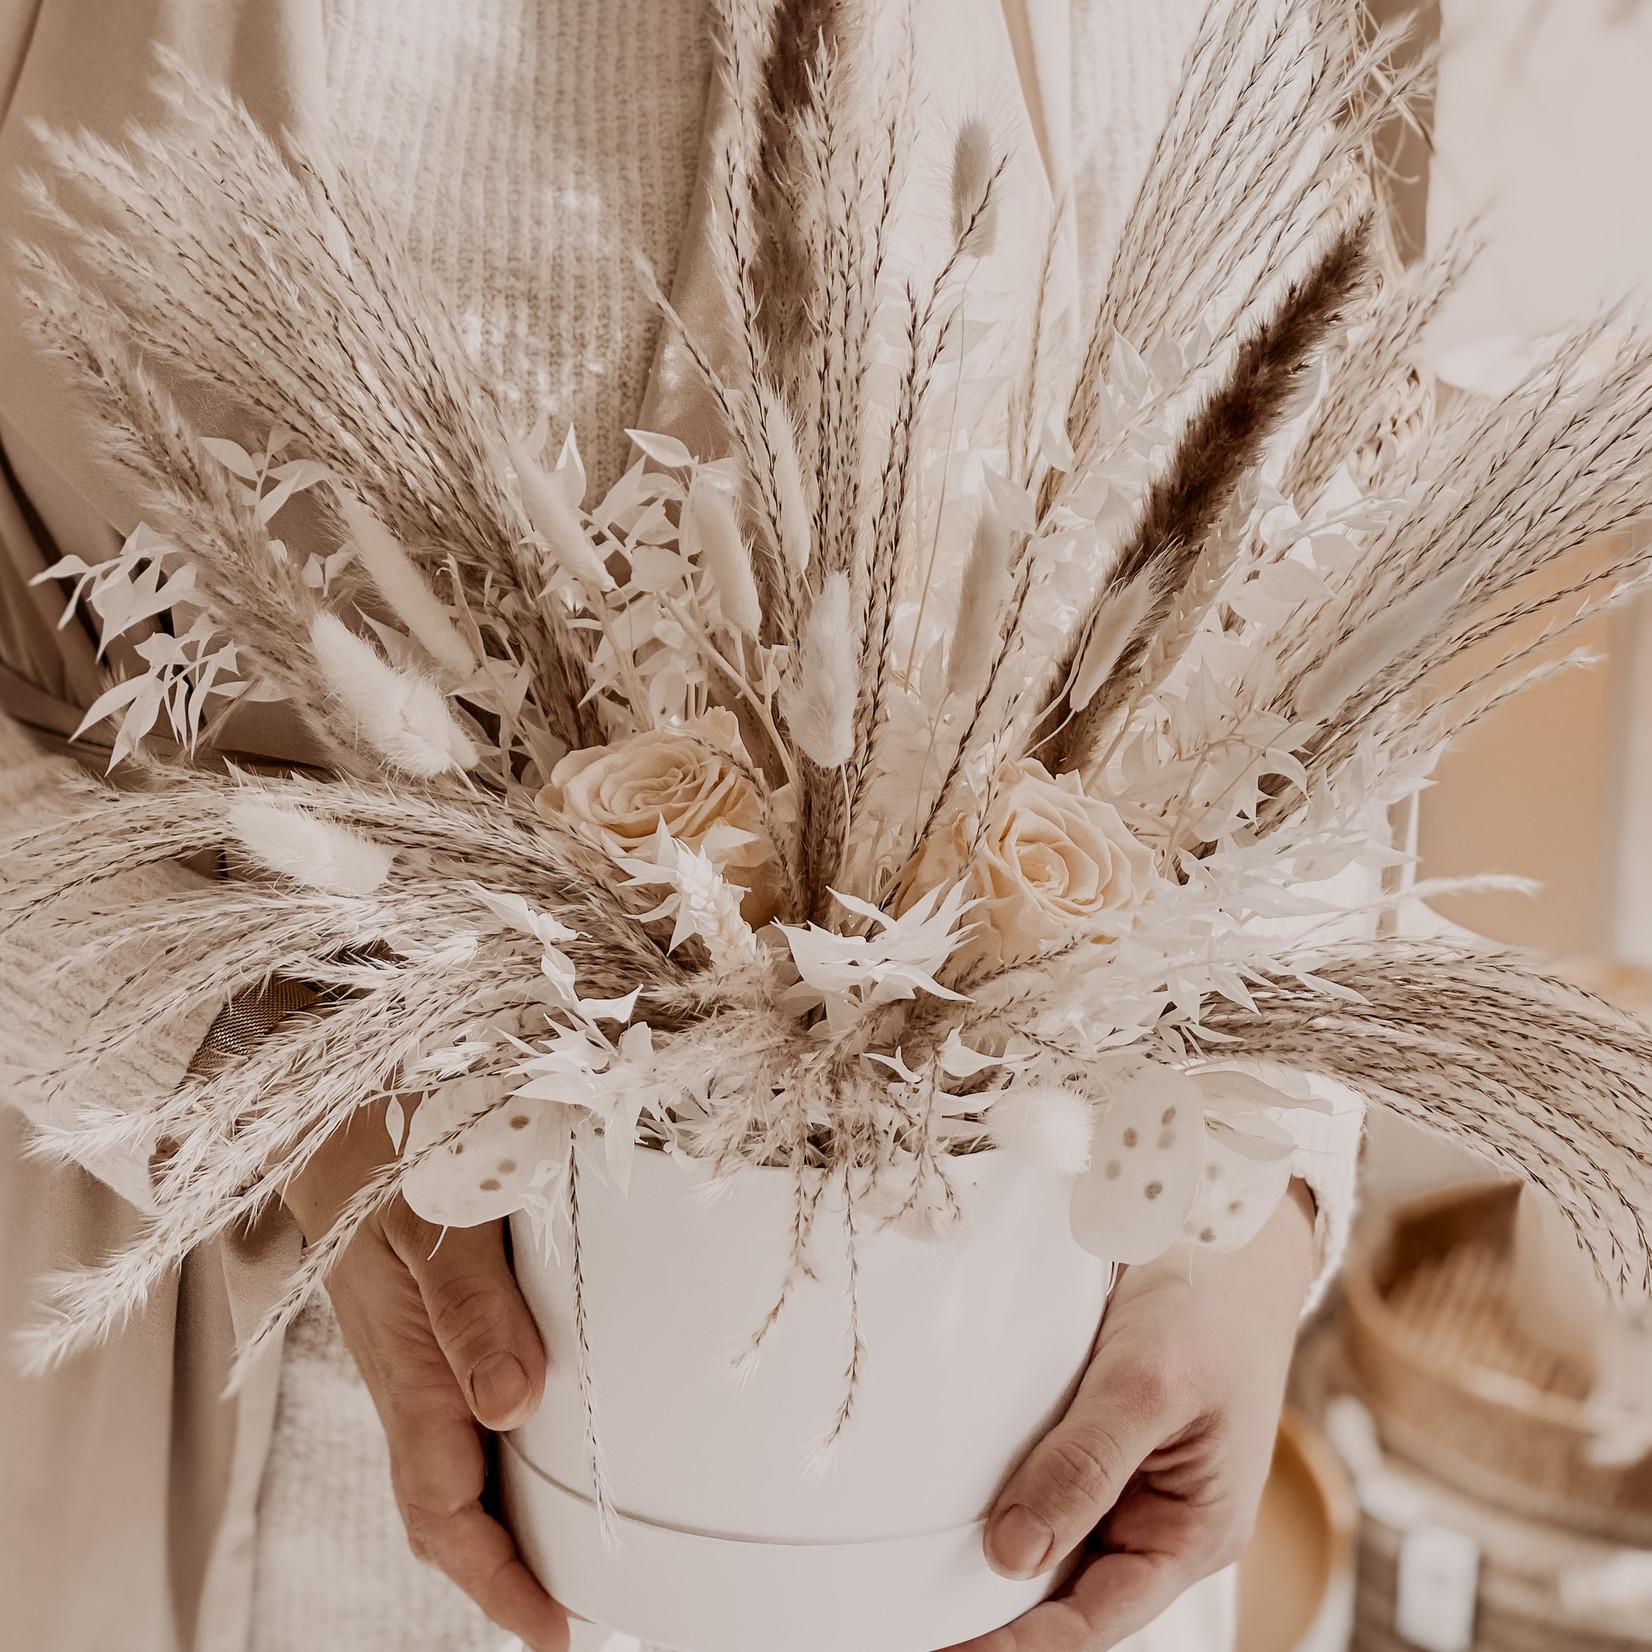 HBX Eternity Flower Box Beige